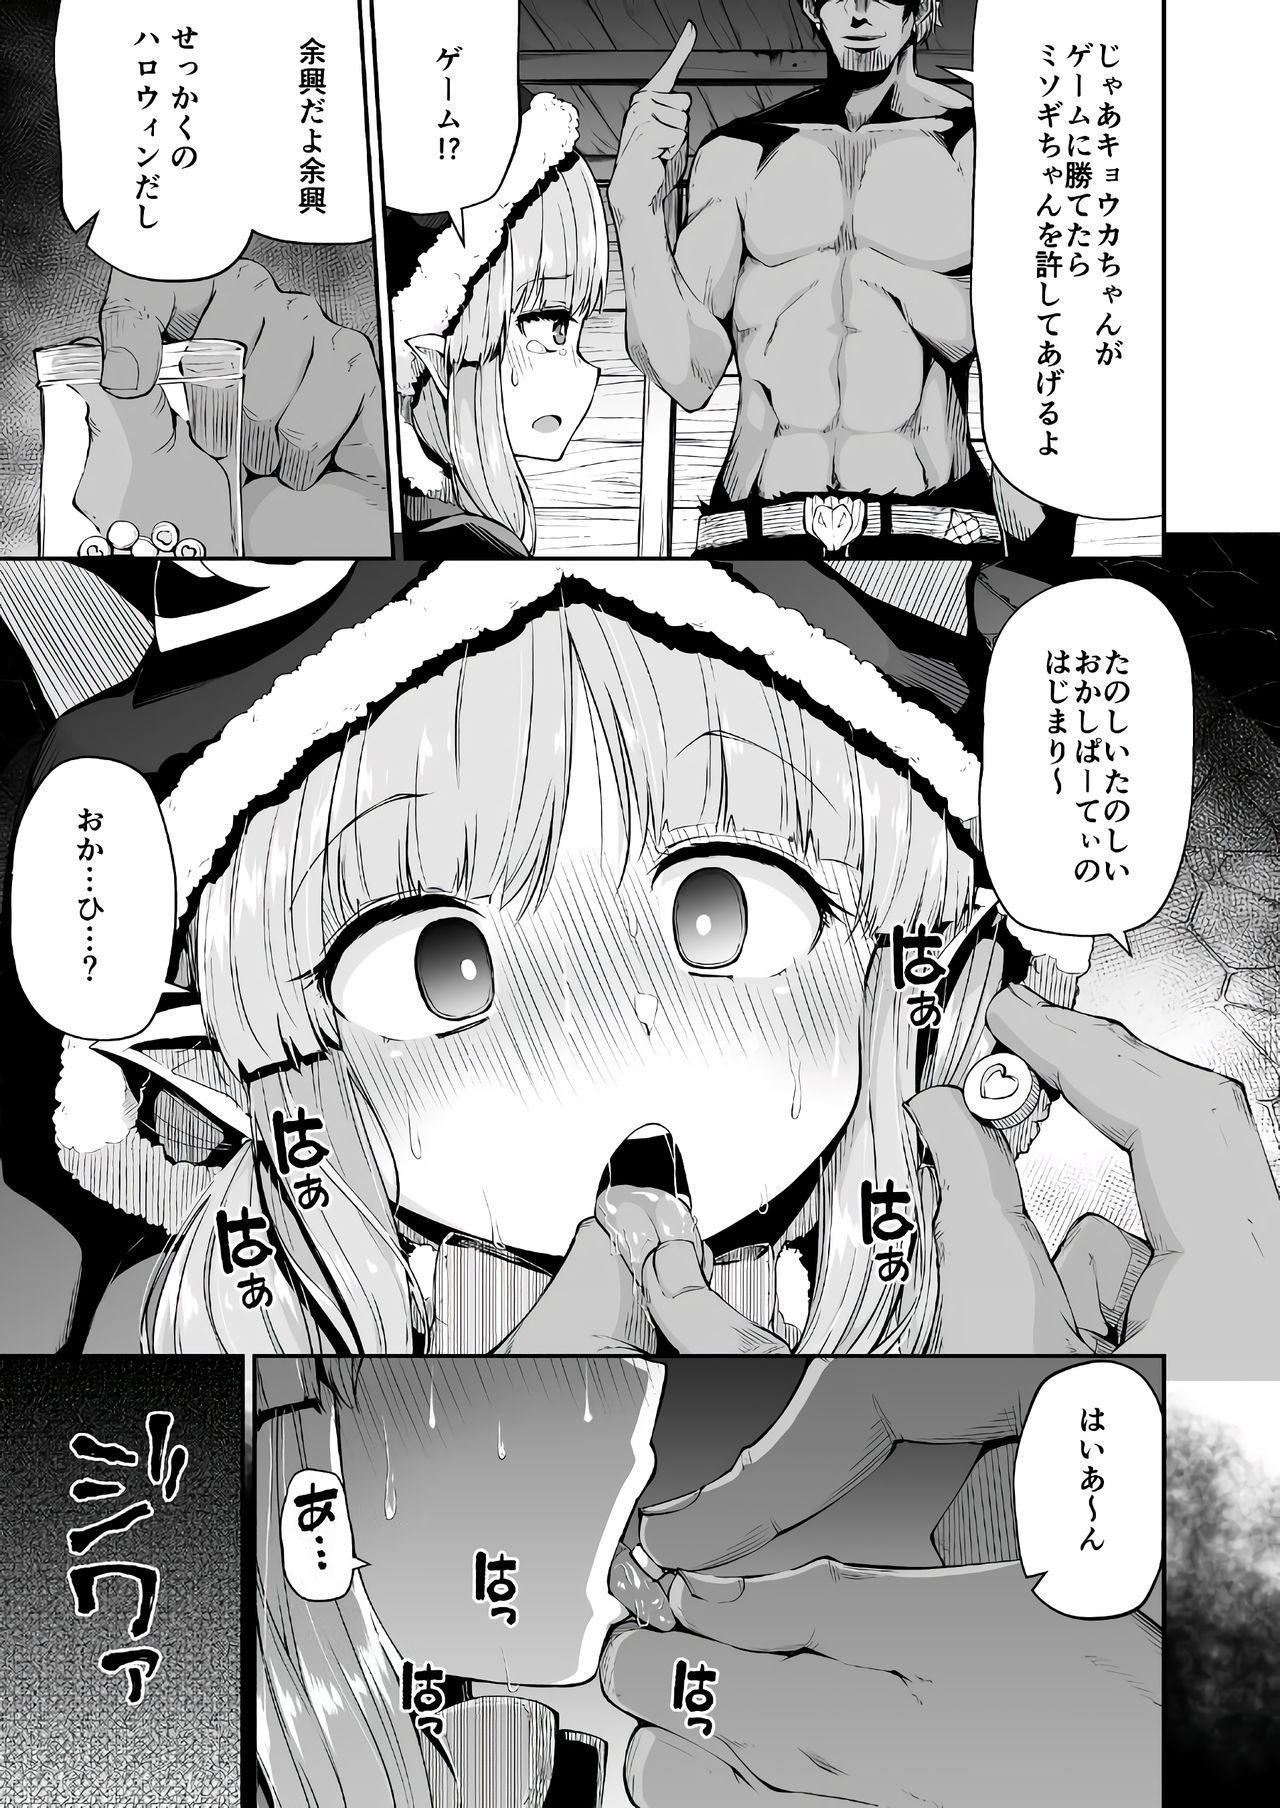 Kyouka-chan to Okashi Party 7